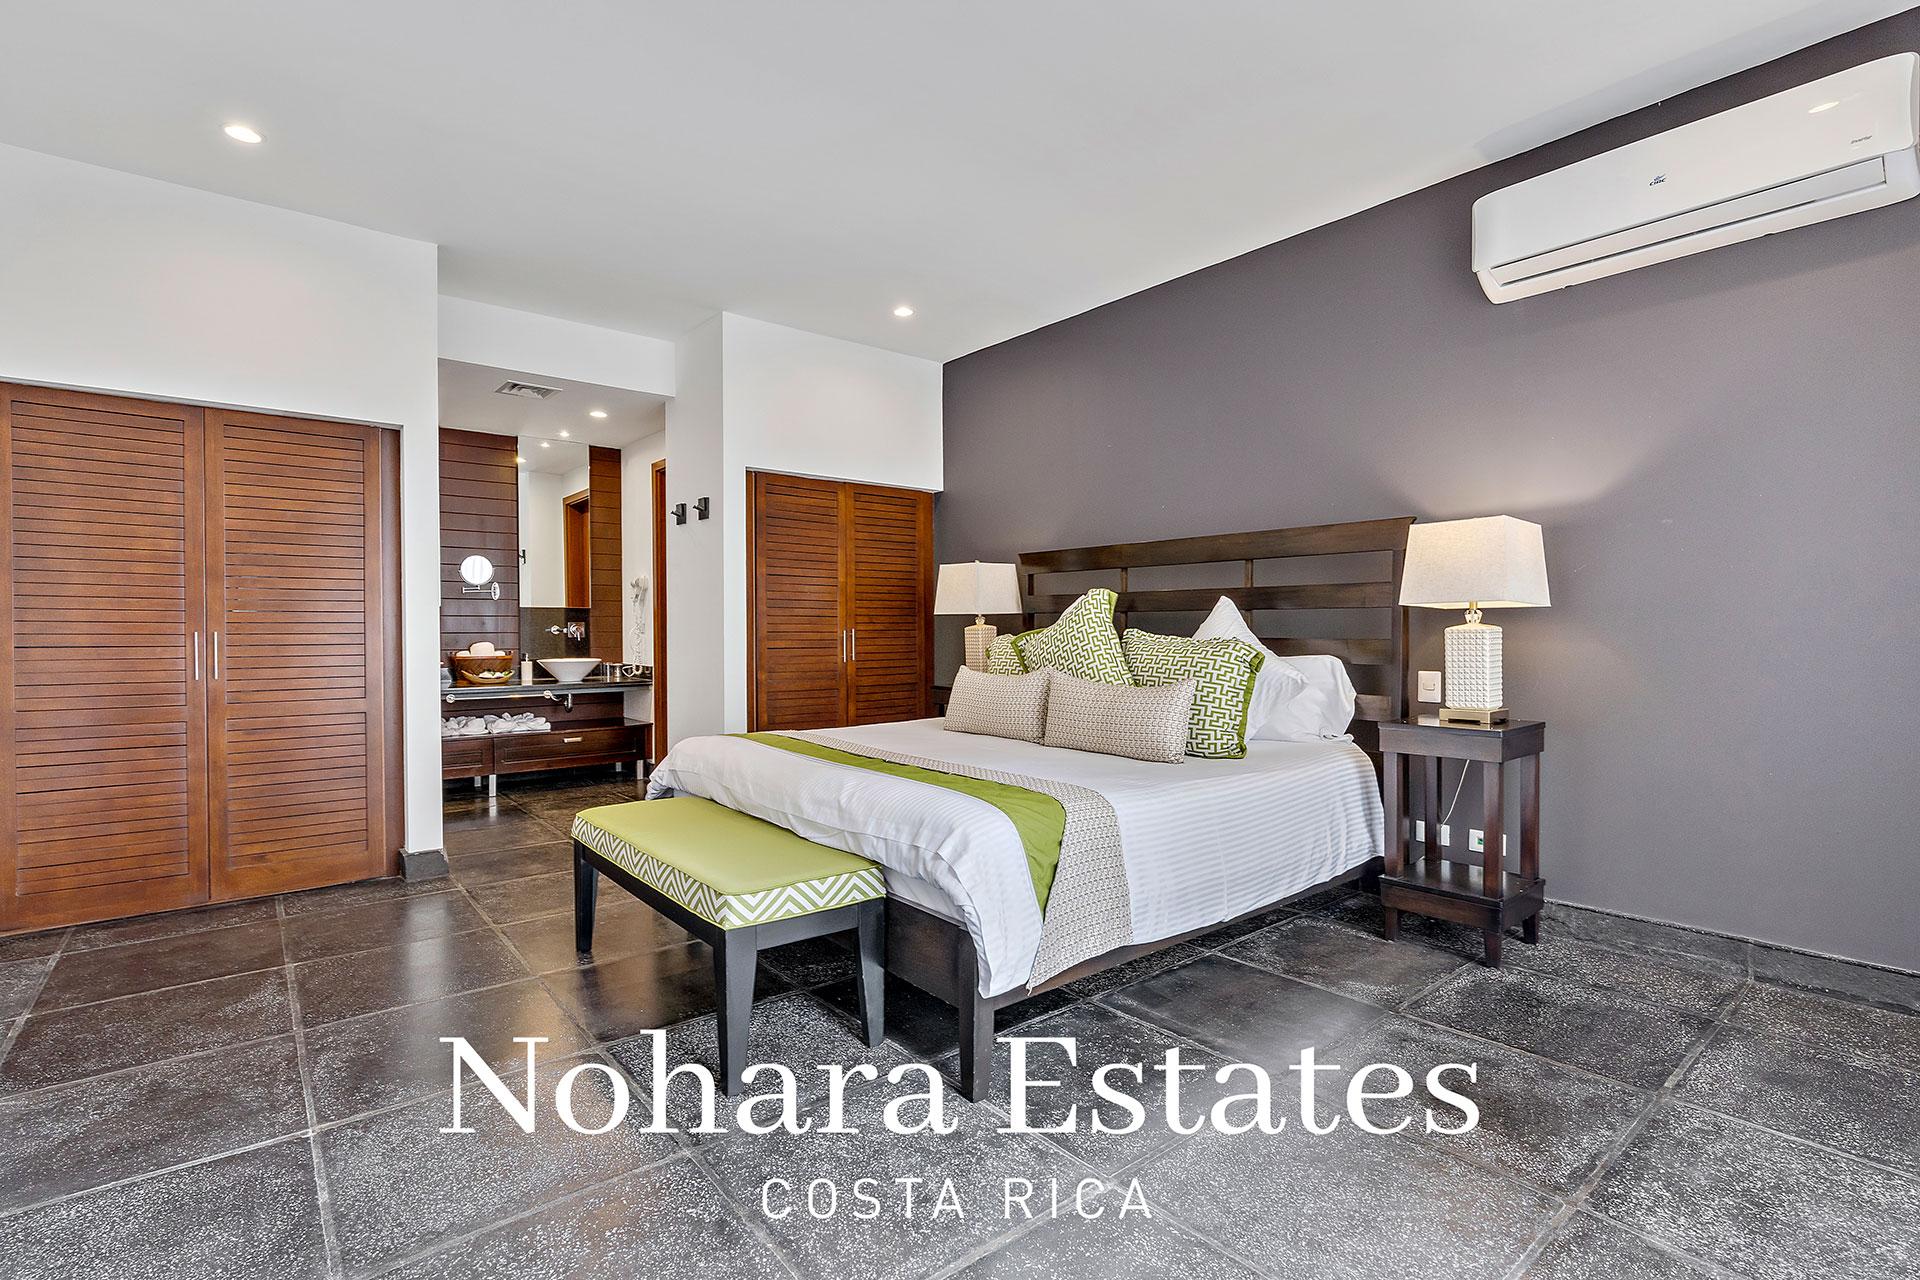 Nohara Estates Costa Rica 128 Penthouse Quepos Los Altos 19